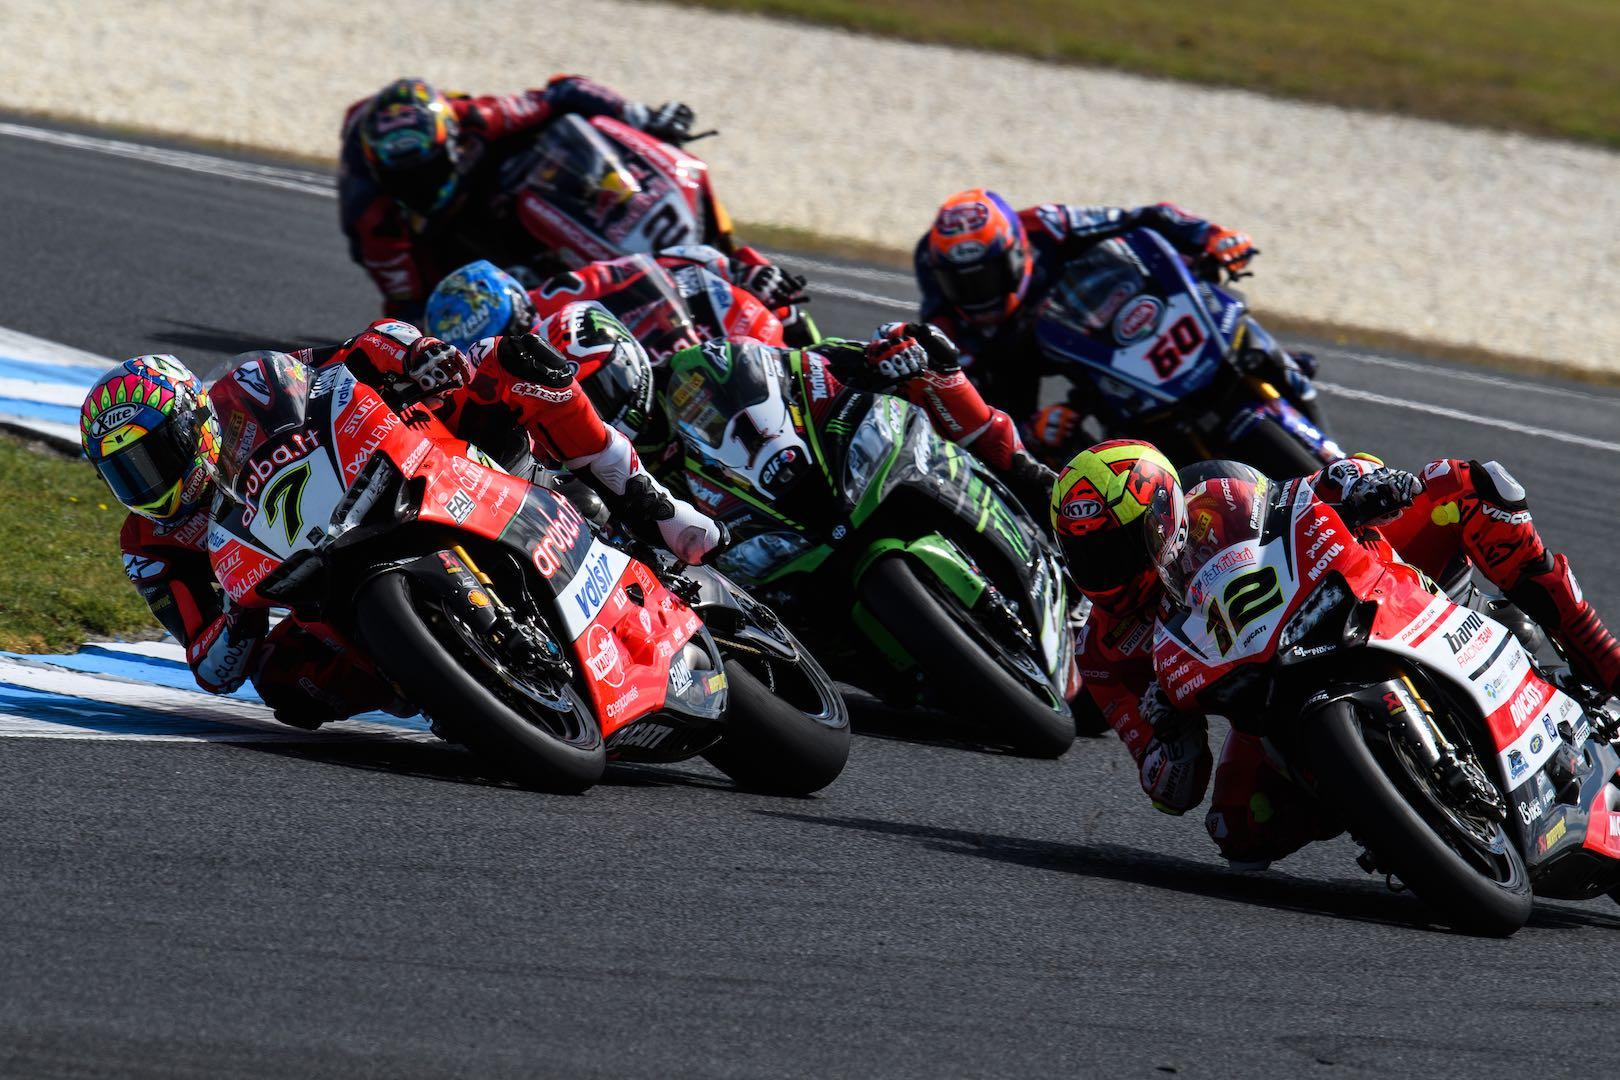 2018 Phillip Island World Superbike Results Ducati's Chaz Davies battles with Rea